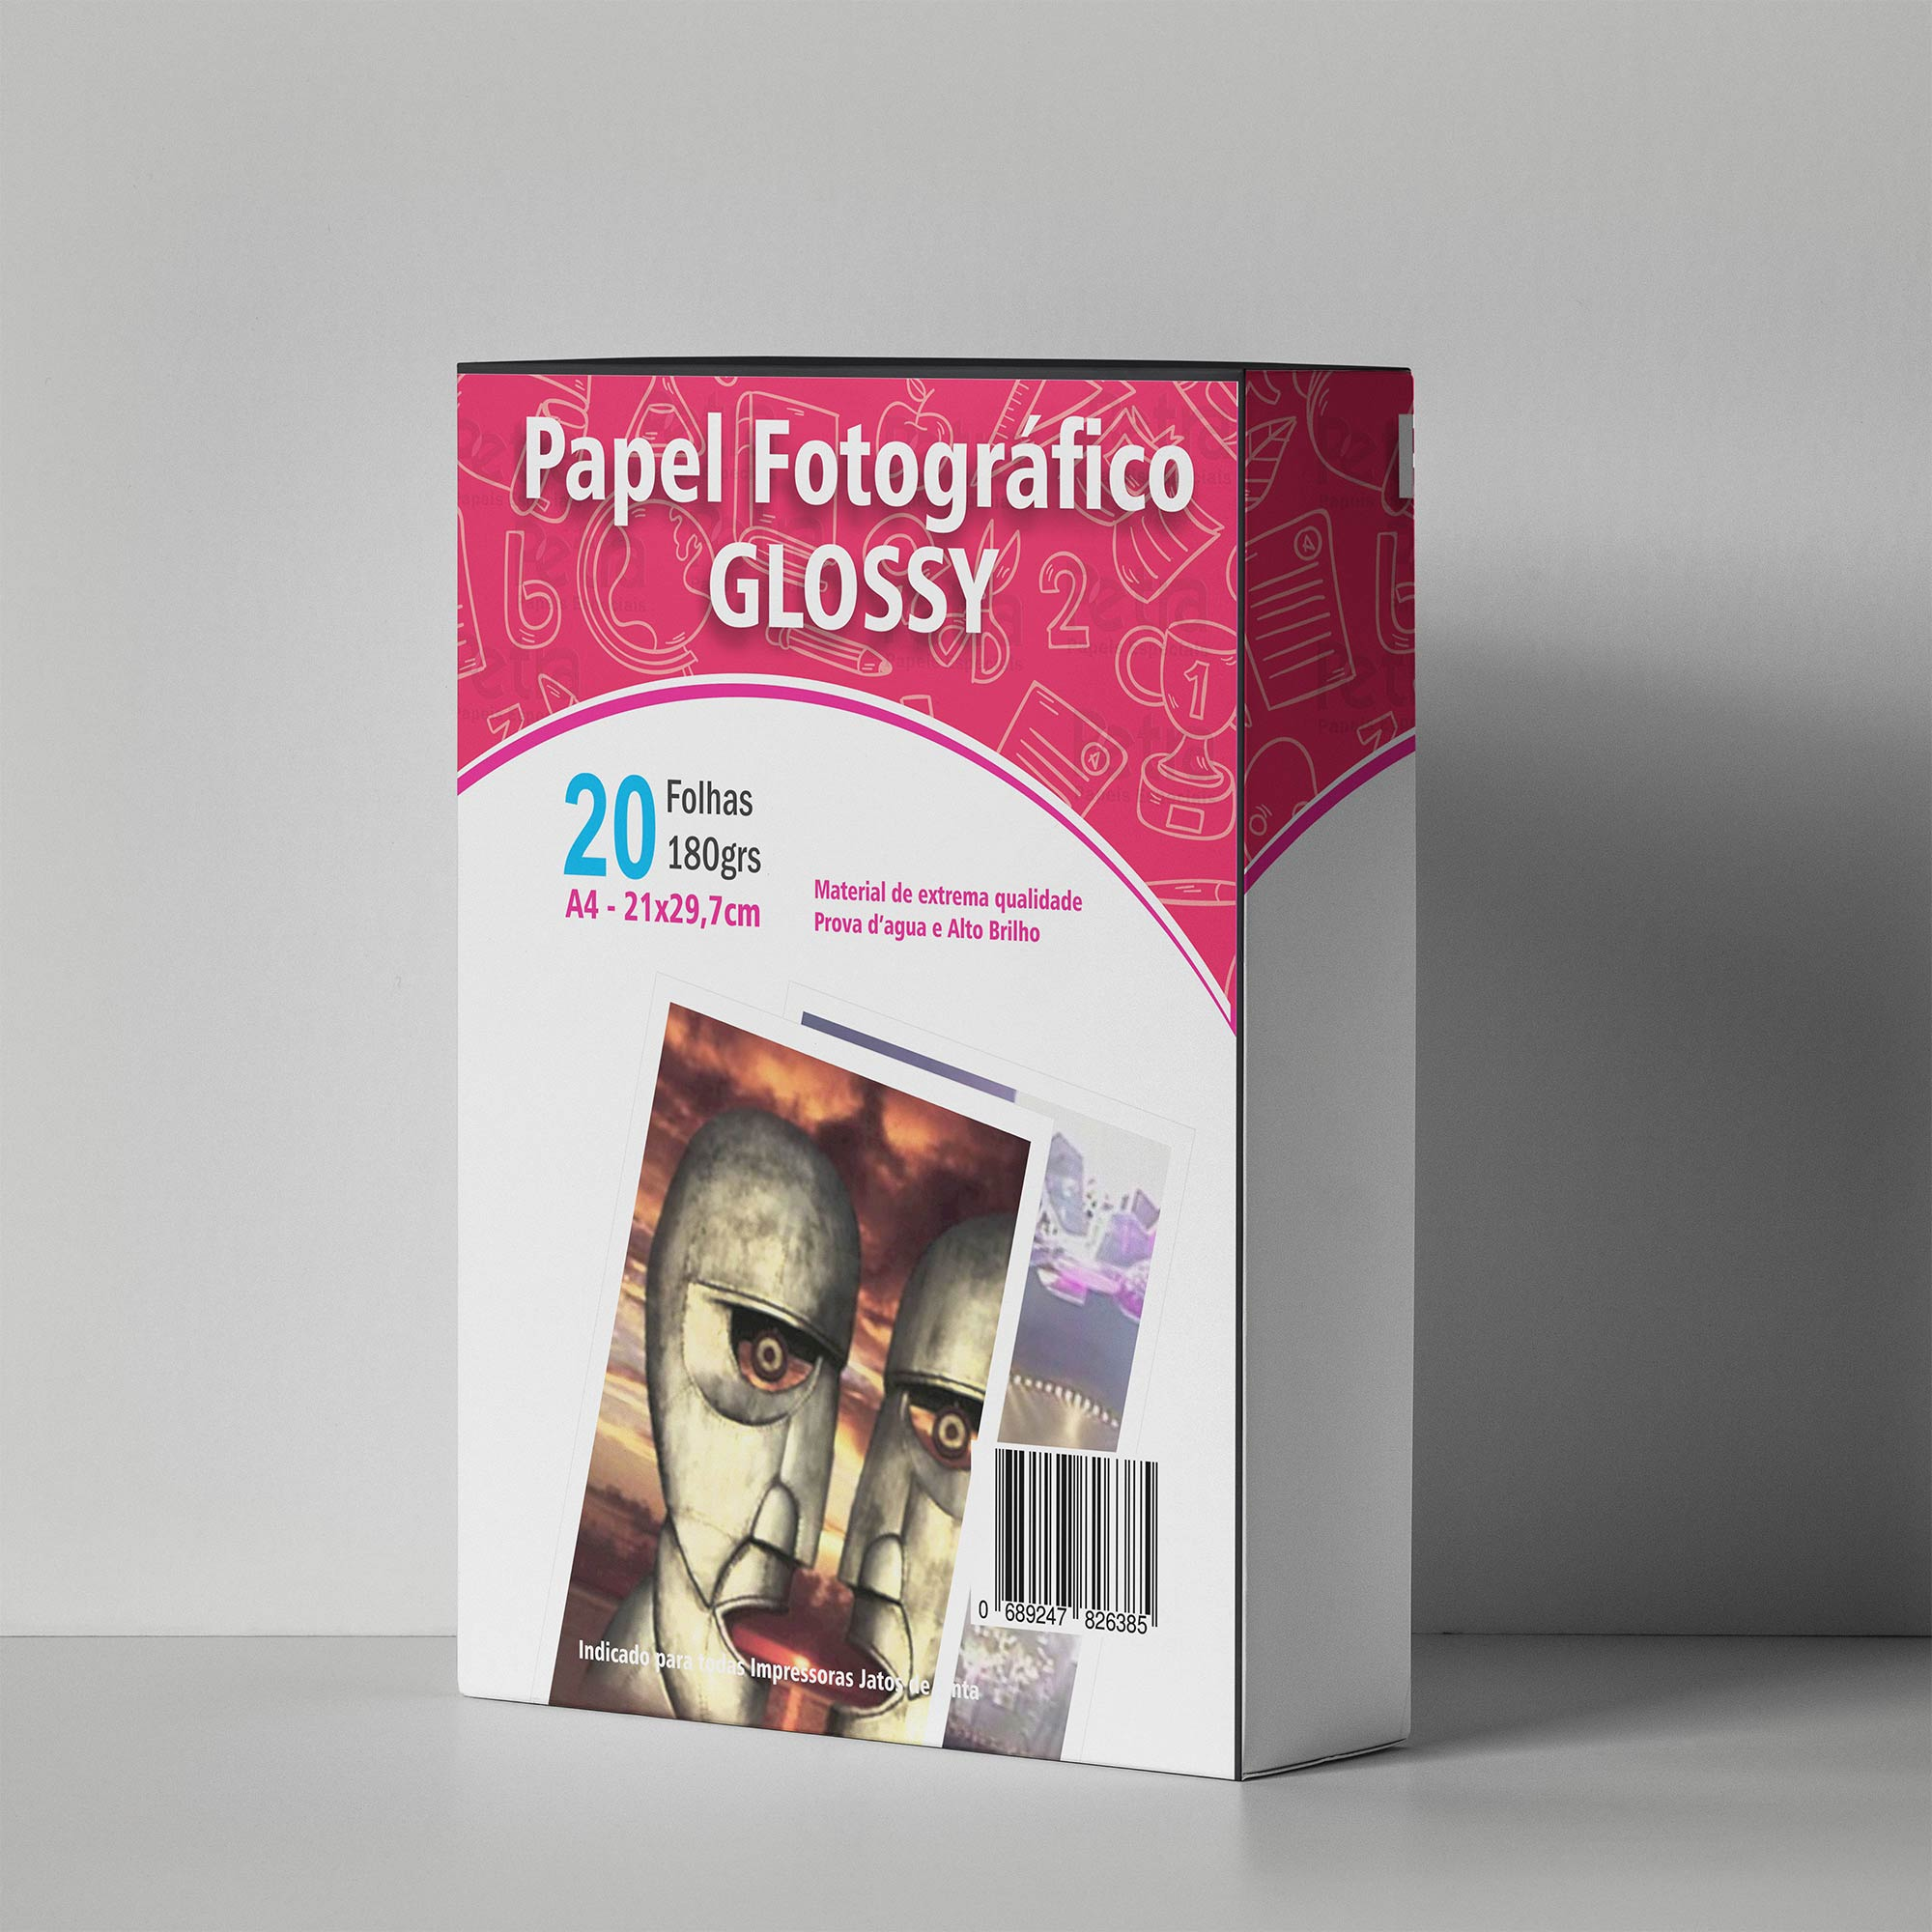 Papel Fotográfico Glossy A4 180g/m² - 20 Folhas